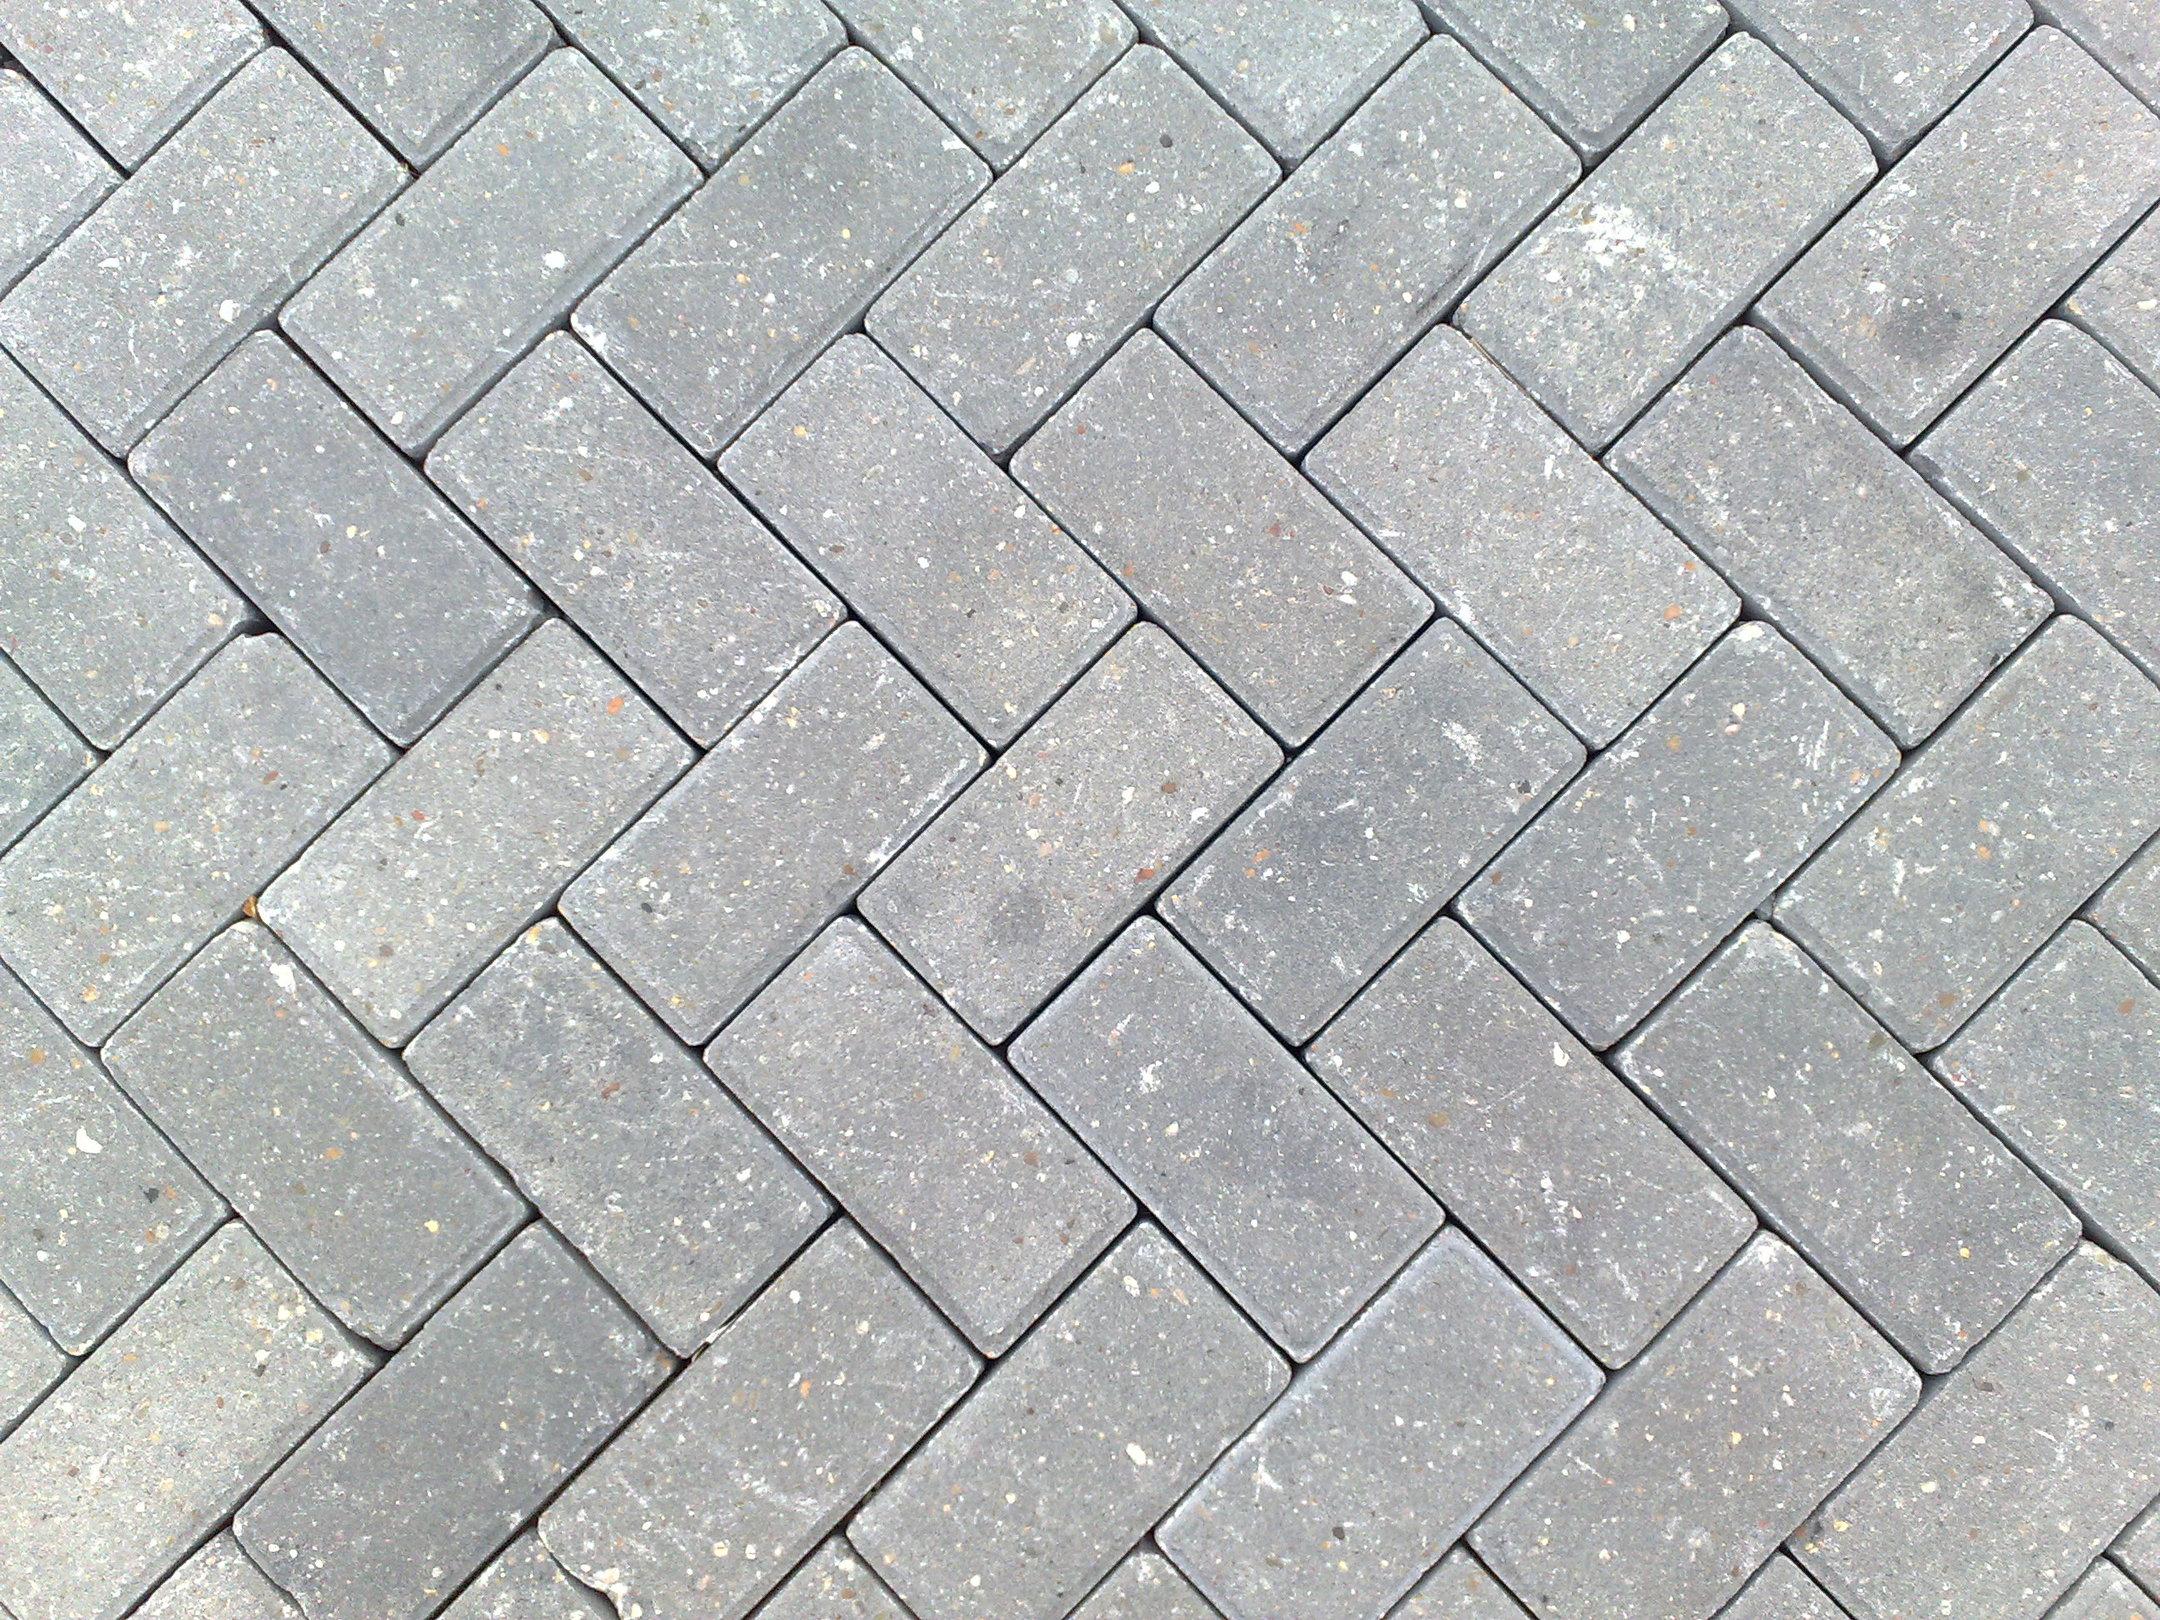 Brick Road 2 Texture by Jay-B-Rich on DeviantArt